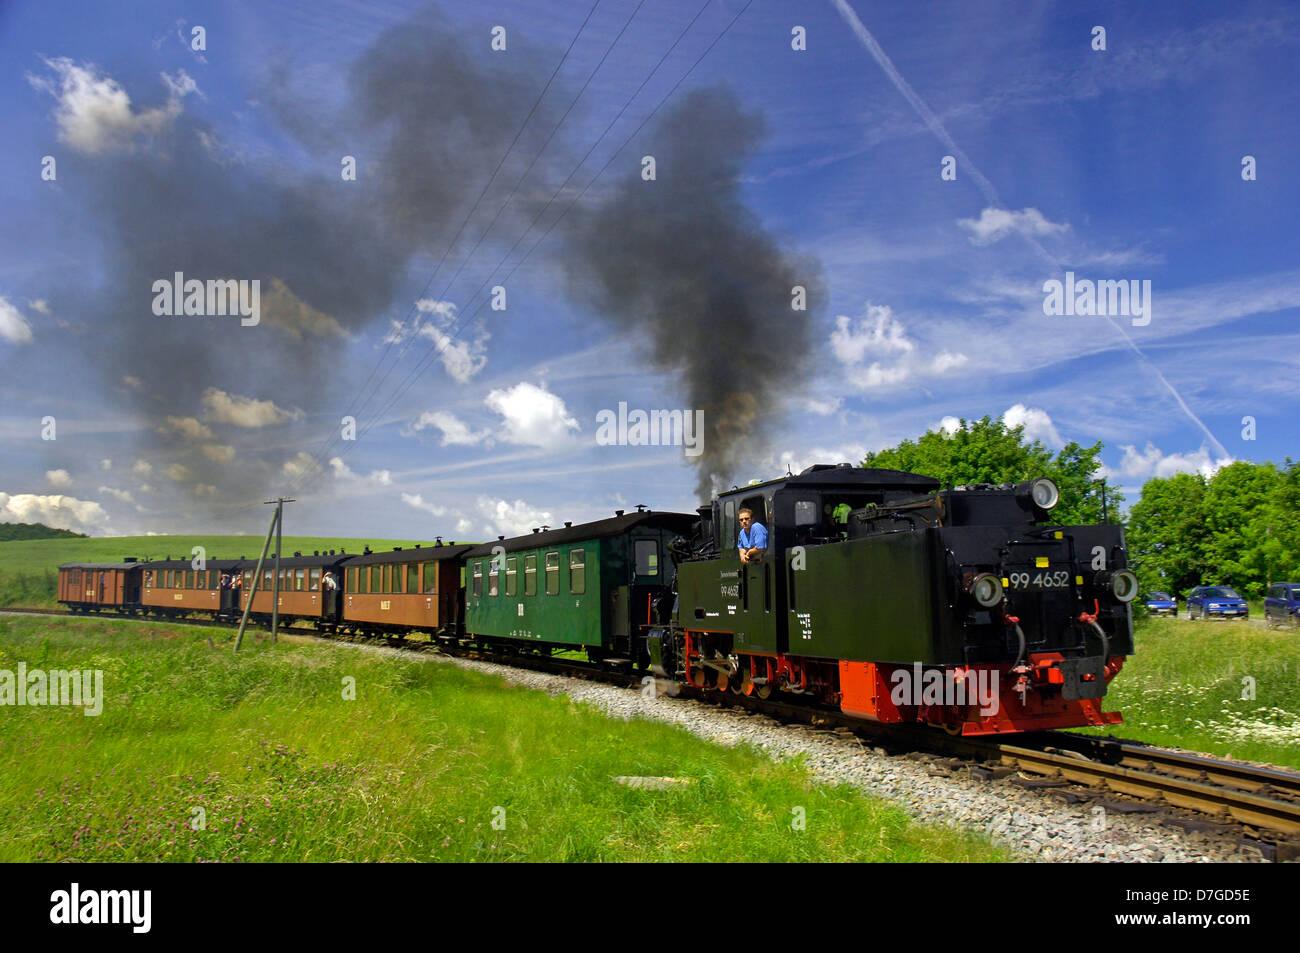 Germany, Mecklenburg-West Pomerania, island Rügen, racing Roland, locomotive, der rasende Roland - Stock Image